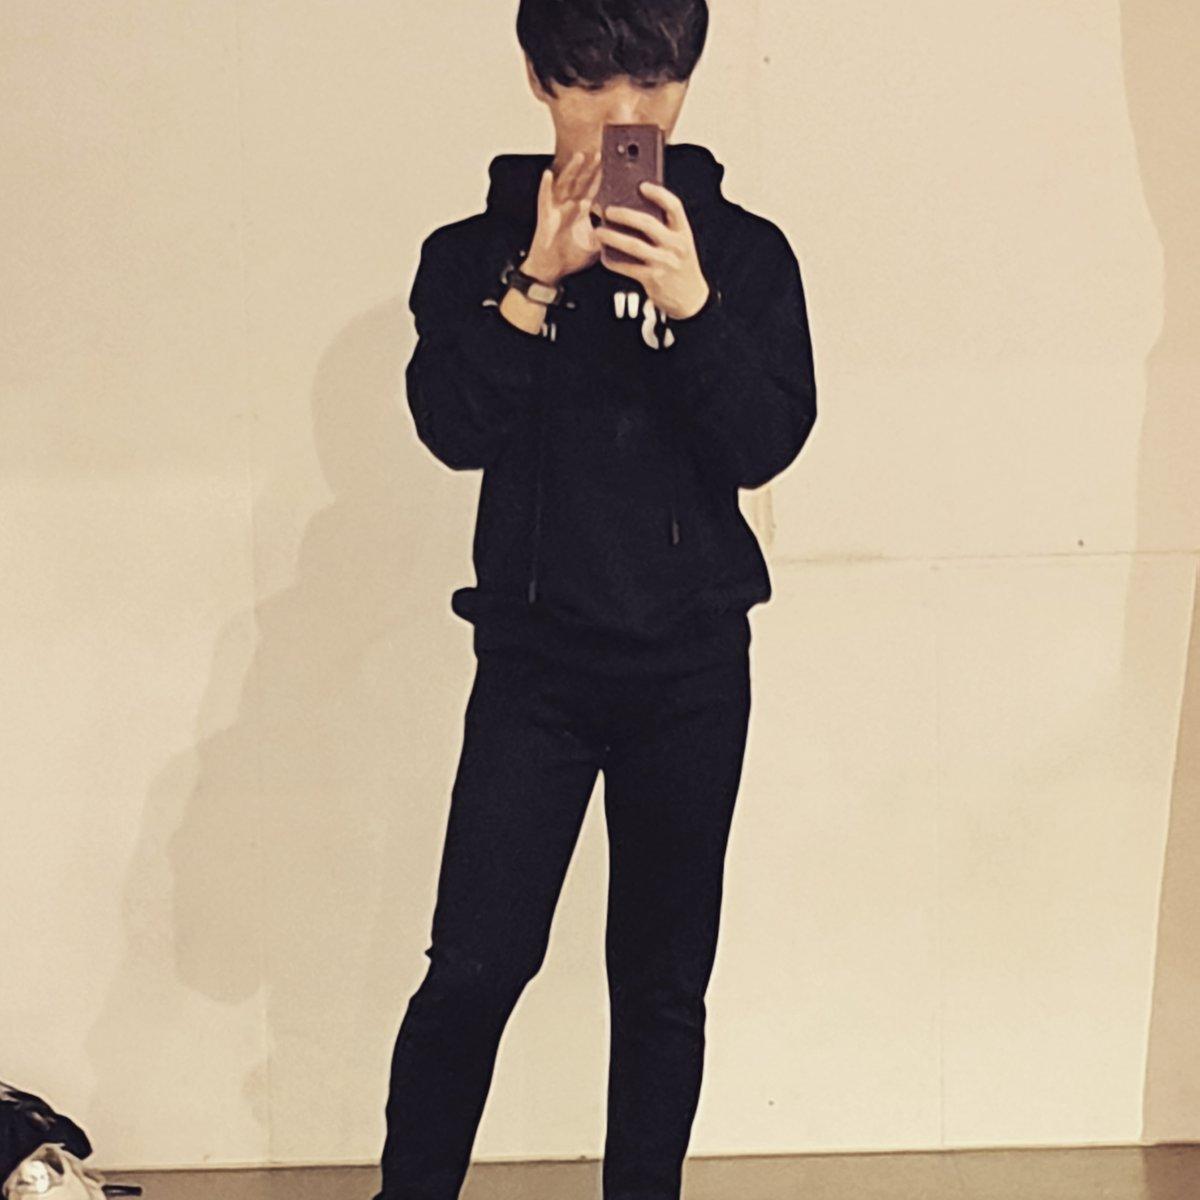 After lesson  #랩을하고춤출때아직살아있음을느껴 #イケメン #한국 #럽스타그램 #좋아요 #kpop#新大久保#LeN #selca #selfie #korean #dailylook #instadaily #instagram #instafashion #fashion #l4l #suga #ユンギ #picoftheday #like4likes #gucci #ウジ #seventeen #bts #데일리룩 #멋스타그램